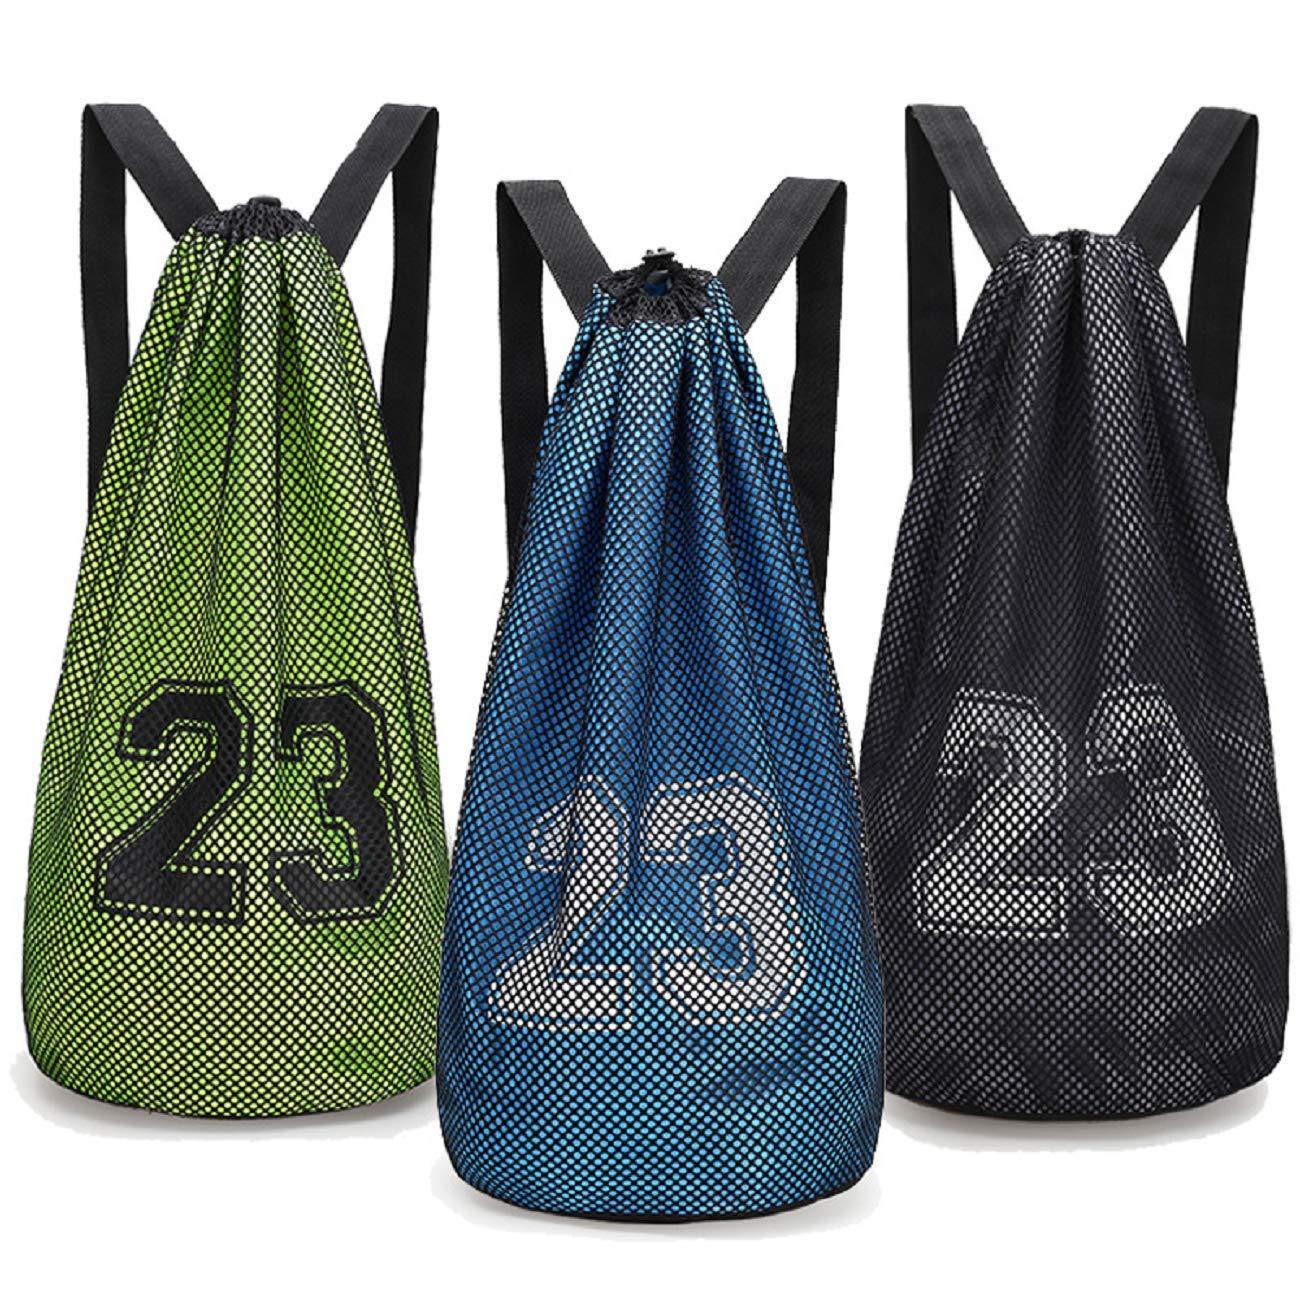 Basketball, Soccer, Organize Sports Gym bag Equip (Green) … (Orange)